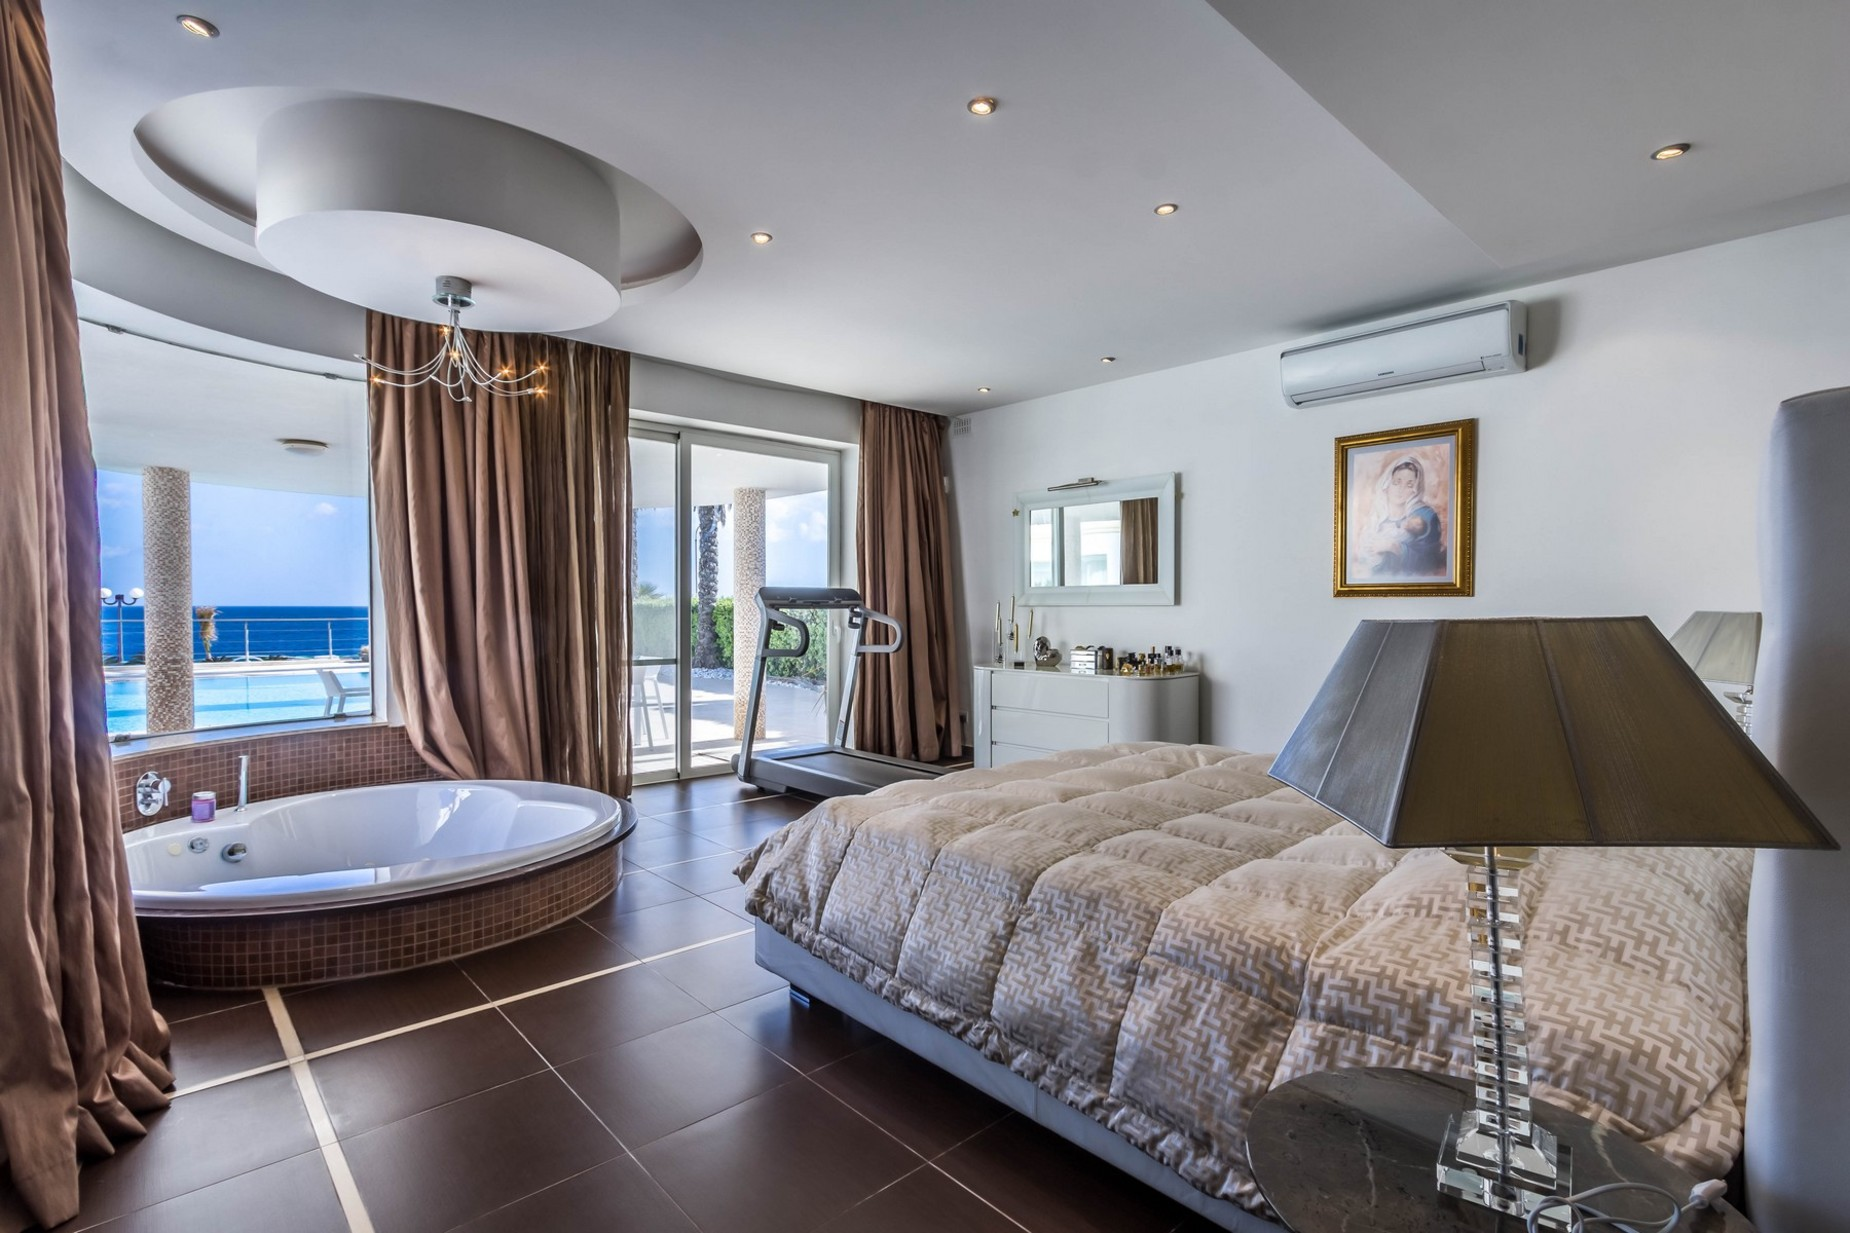 4 bed Villa For Rent in Marsascala, Marsascala - thumb 11